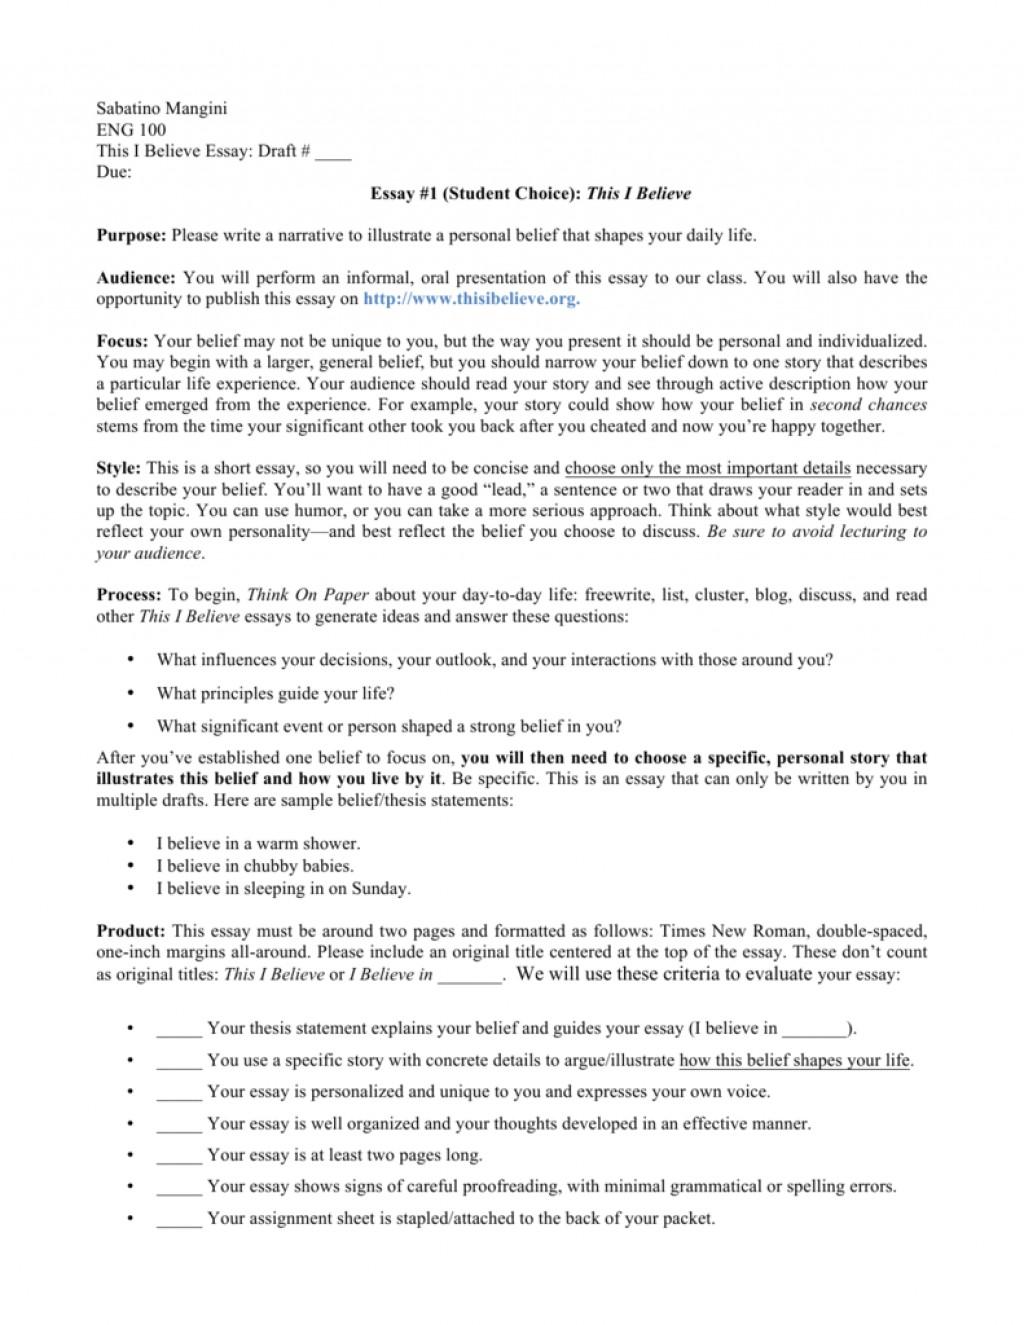 007 008807227 1 I Belive Essays Essay Surprising Believe About Sports Ideas Large